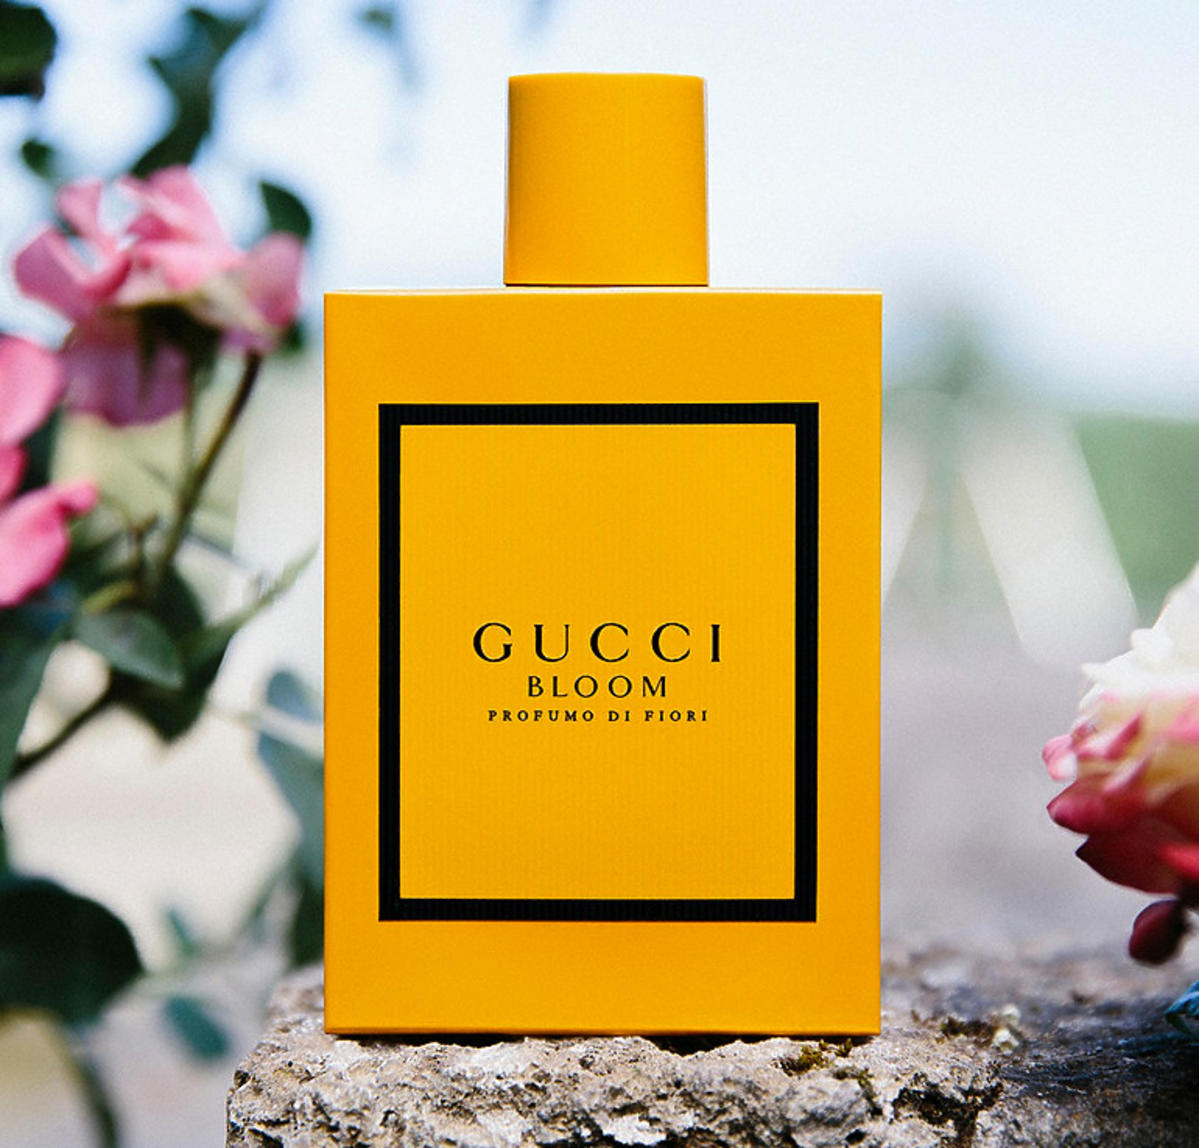 Gucci BloomProfumo di Fiori